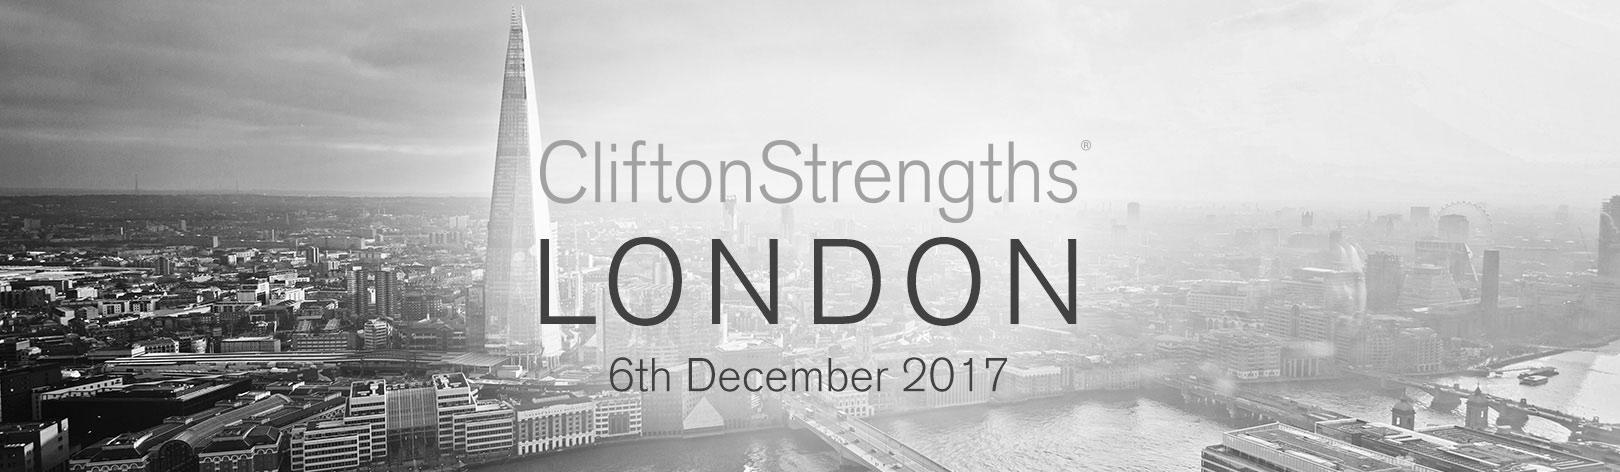 CliftonStrengths Summit - London